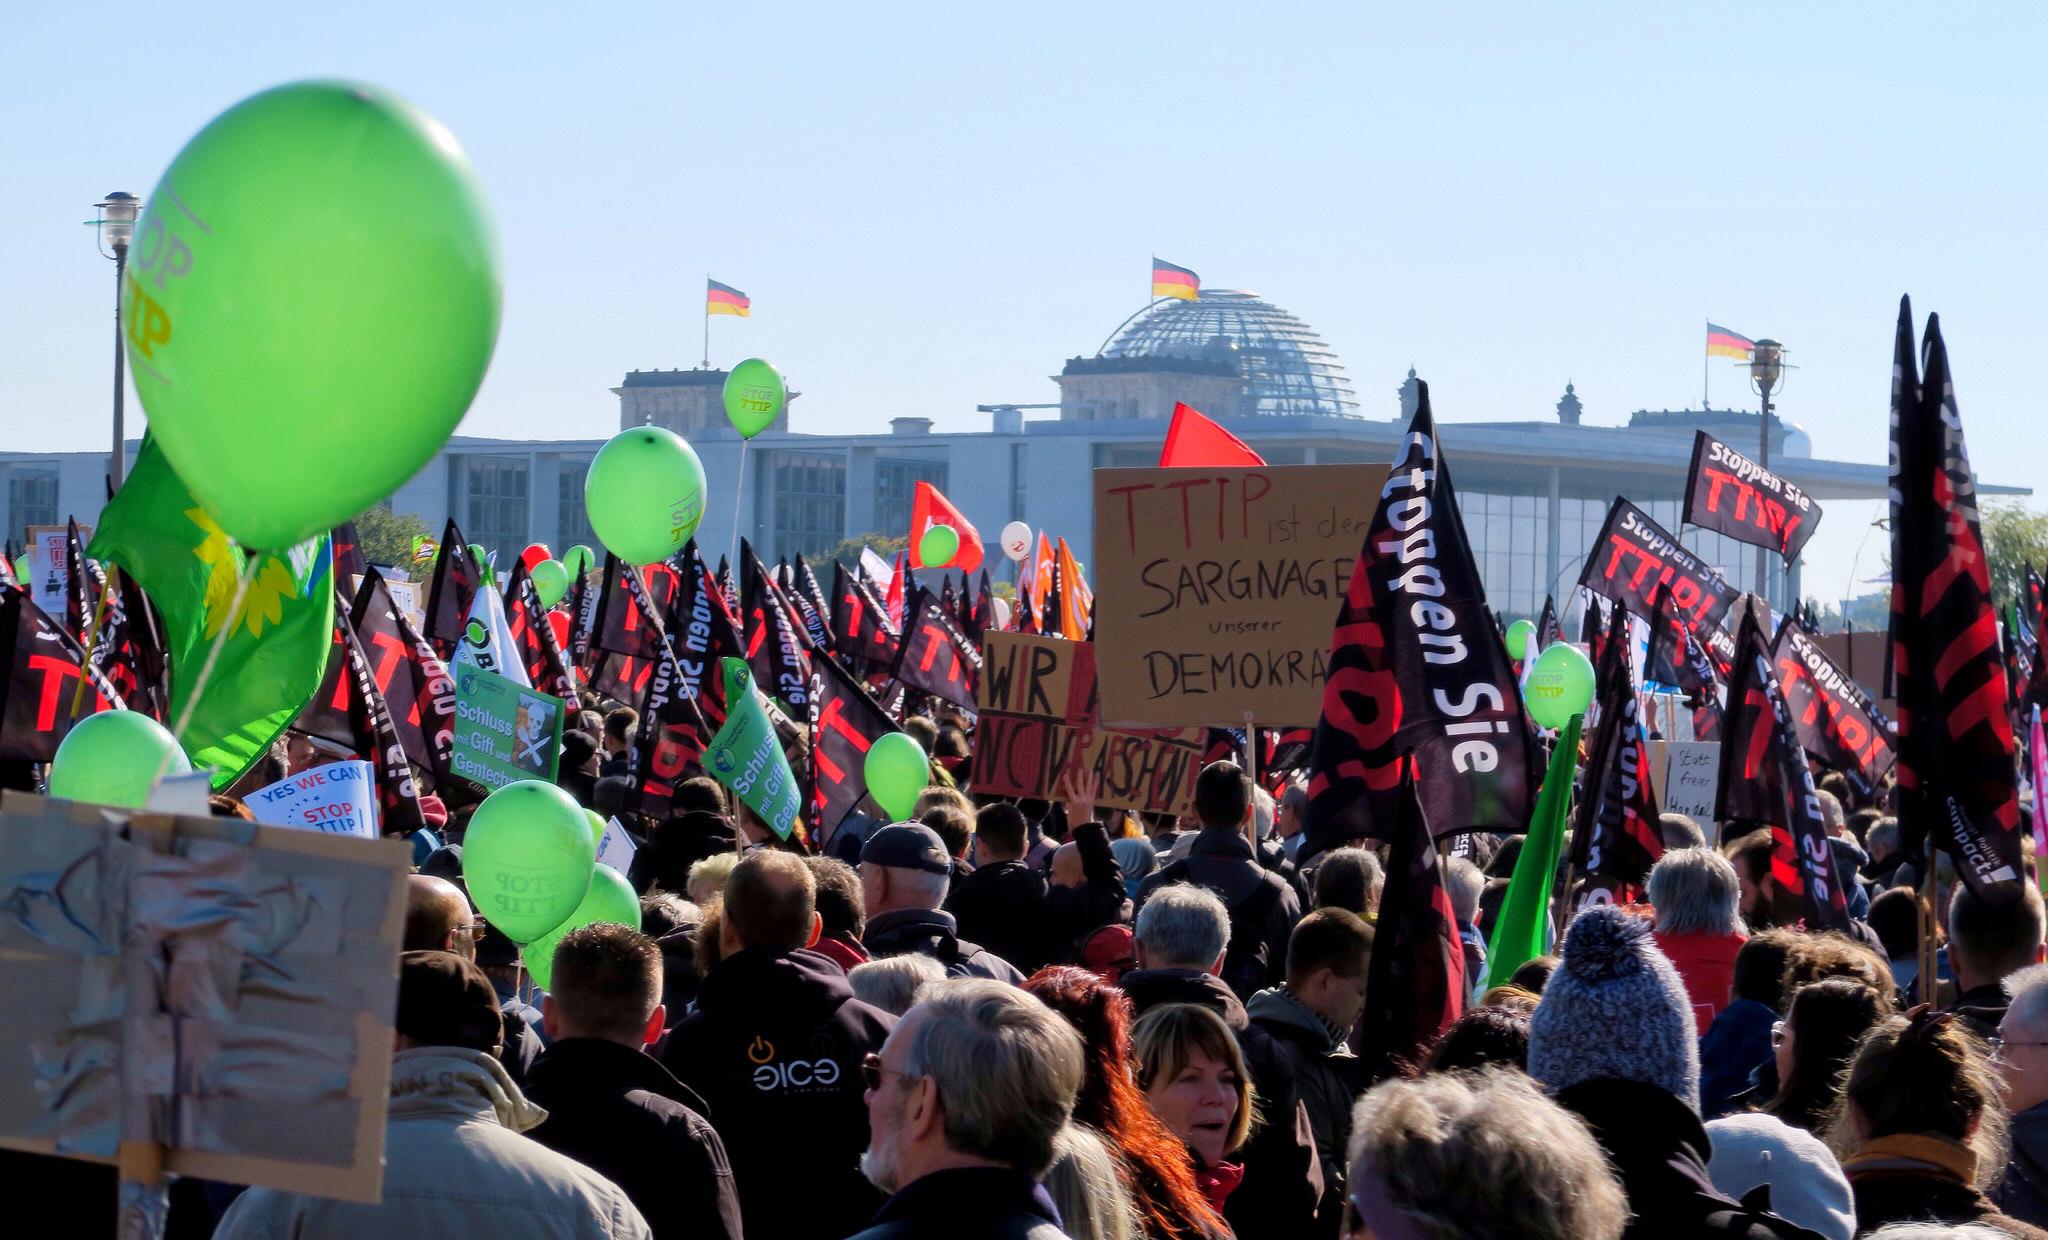 Demonstranten gegen die Freihandelsabkommen TTIP und CETA in Berlin